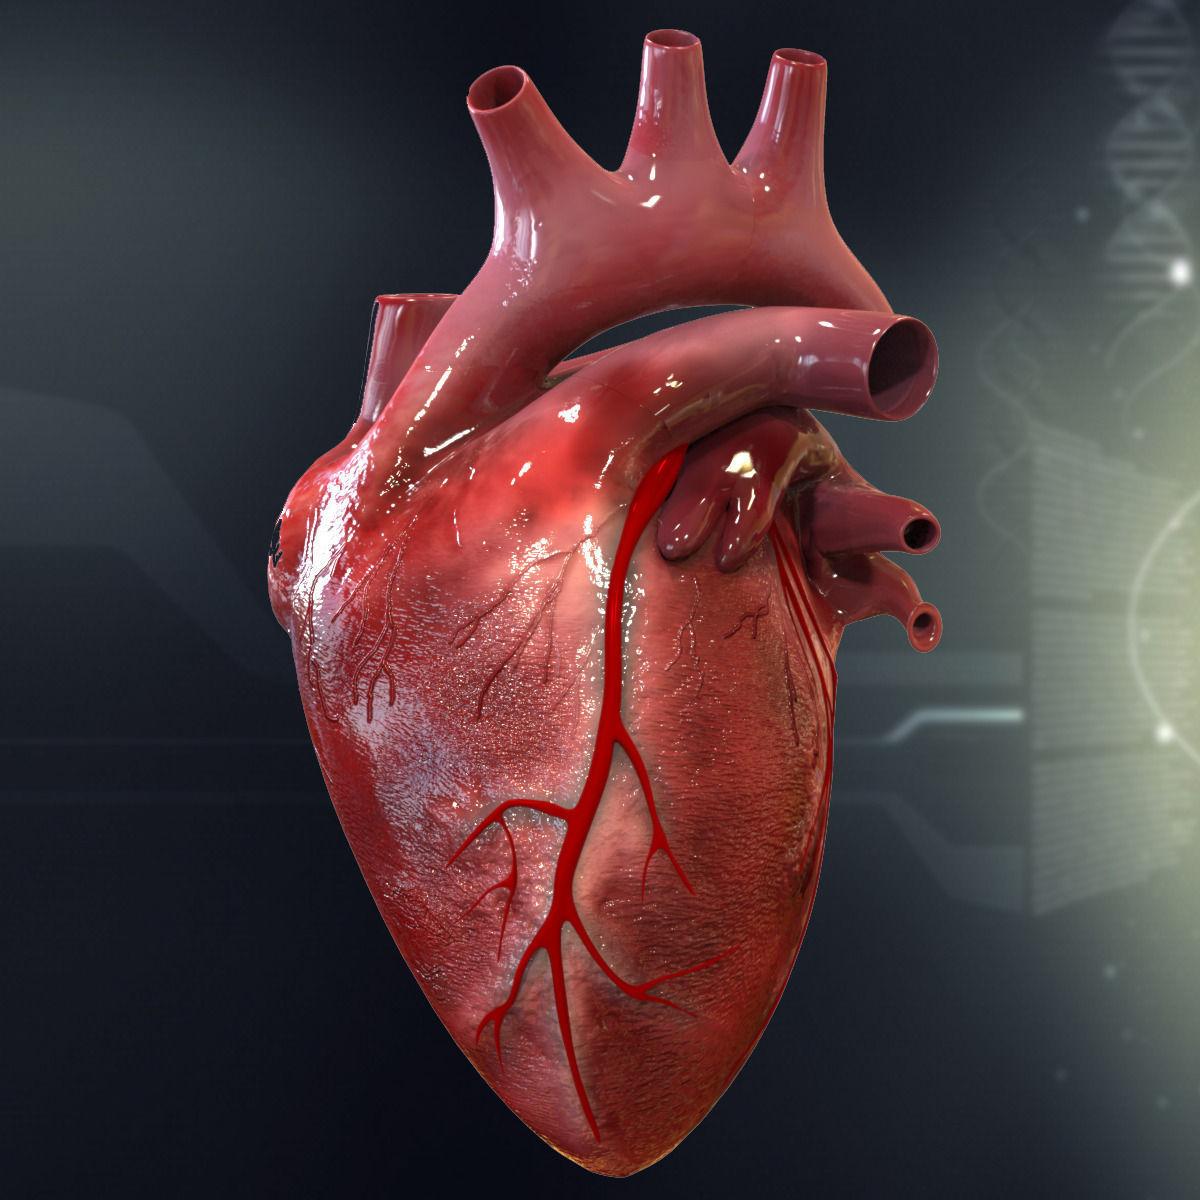 Human Heart Cutaway Anatomy 3D model section | CGTrader